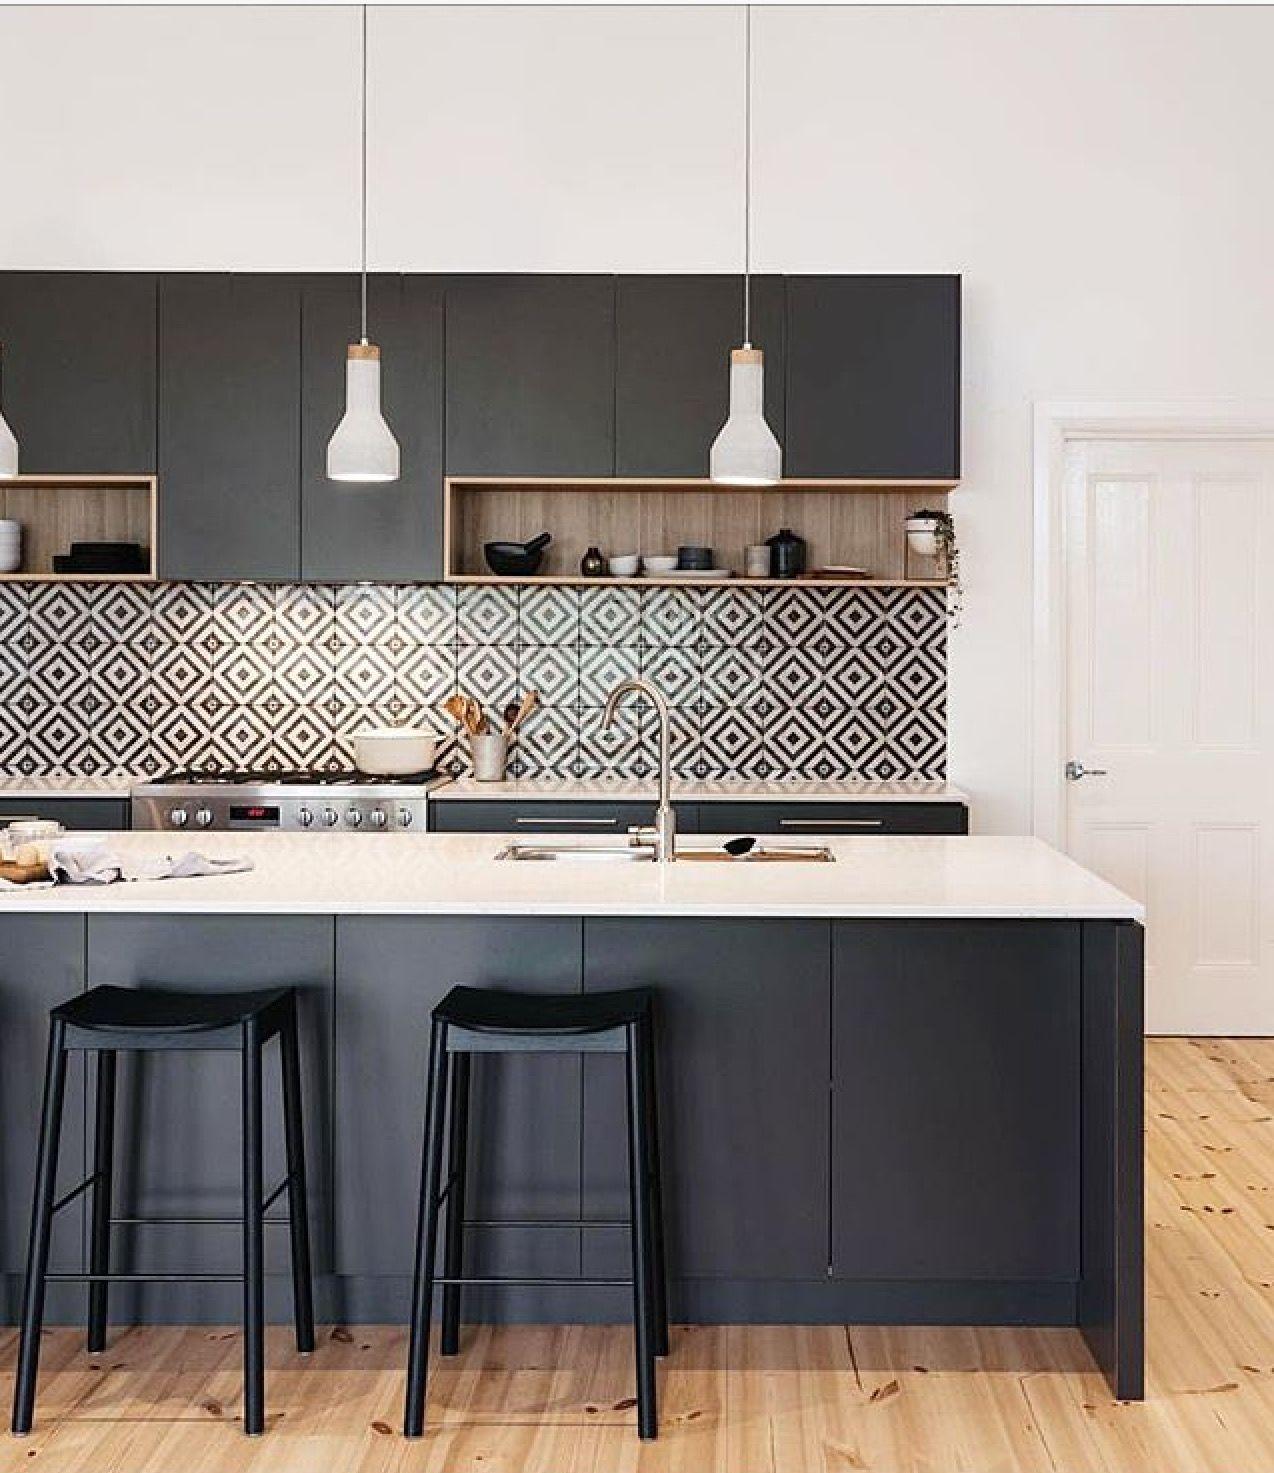 Pin de The Gilded Pear en Kitchen Style | Pinterest